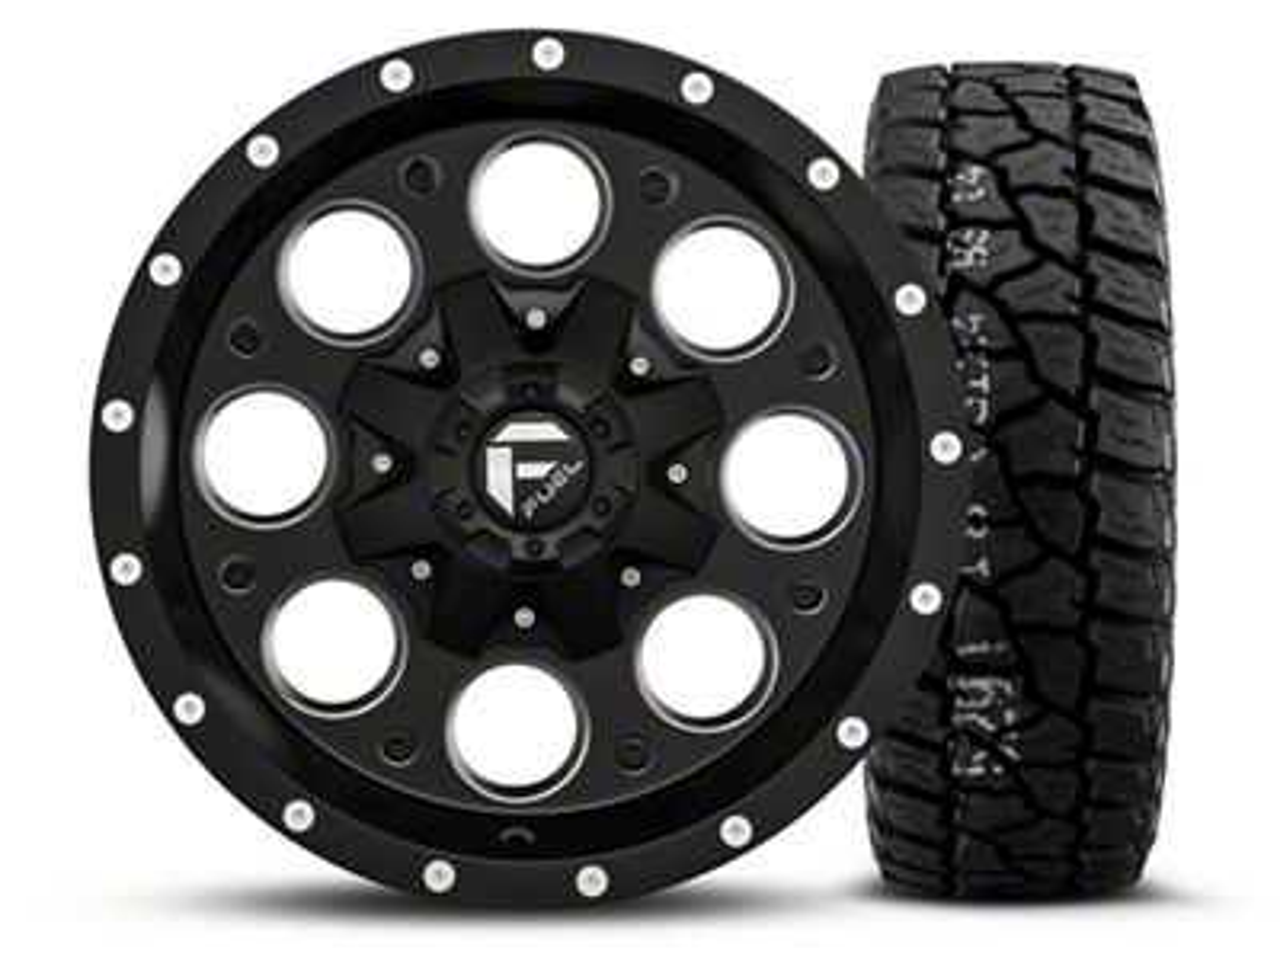 Fuel Wheels Revolver - Black/Milled 16x8 Wheel - and Mickey Thompson Baja ATX P3 Tire - 315/75R16 (07-18 Jeep Wrangler JK)